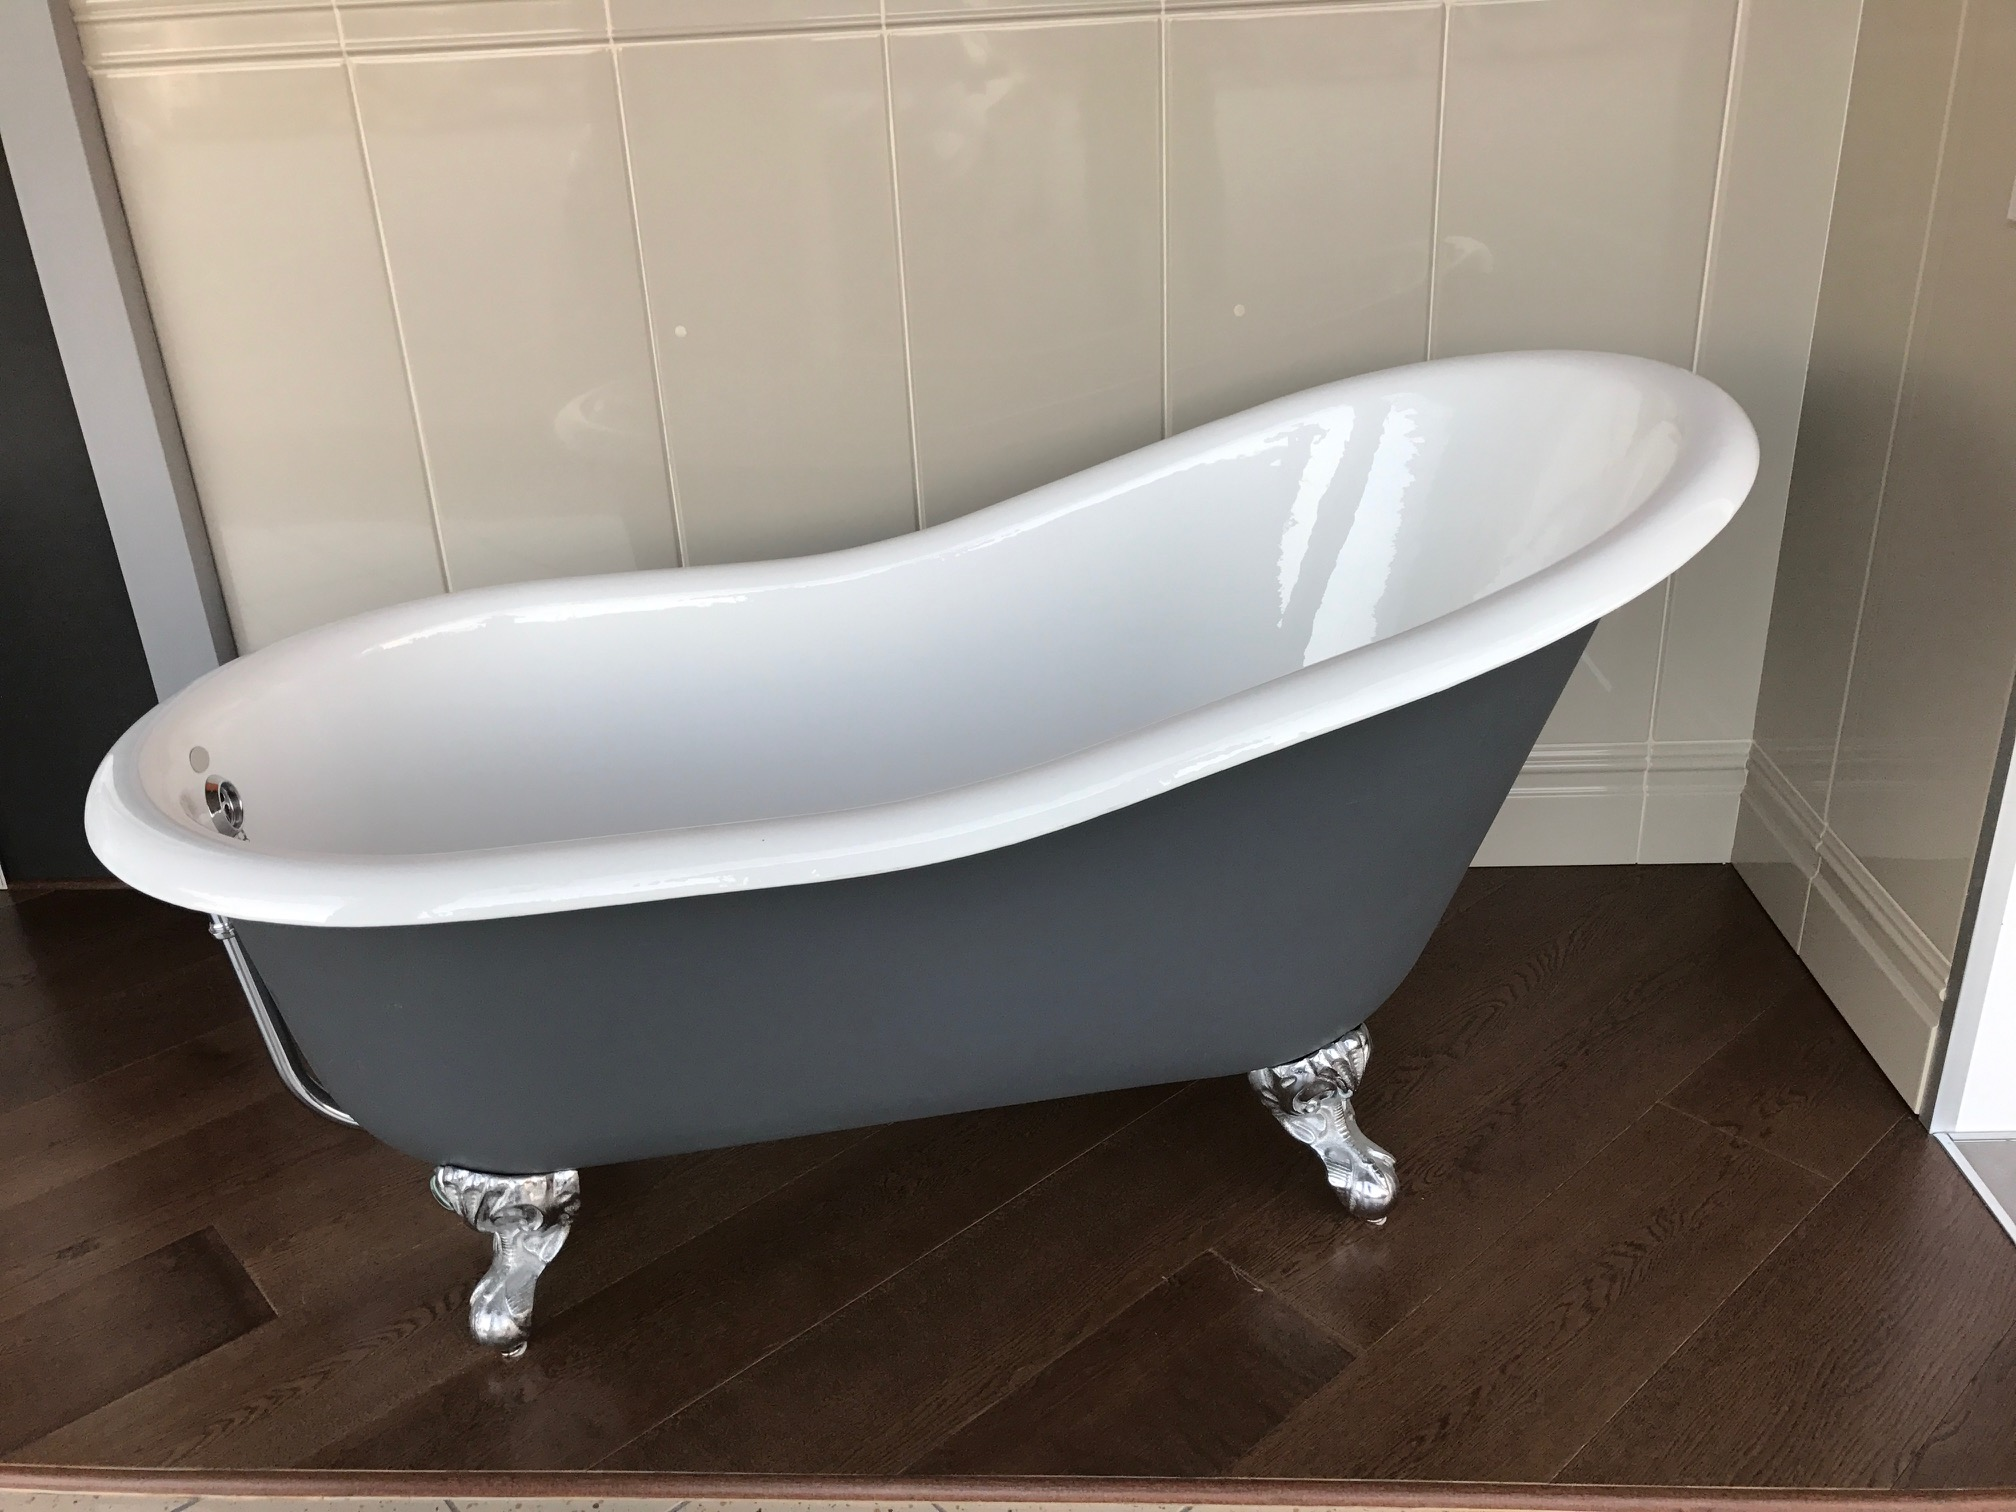 Vasca Da Incasso In Ghisa : Vasca da bagno in ghisa modello slipper euroedil